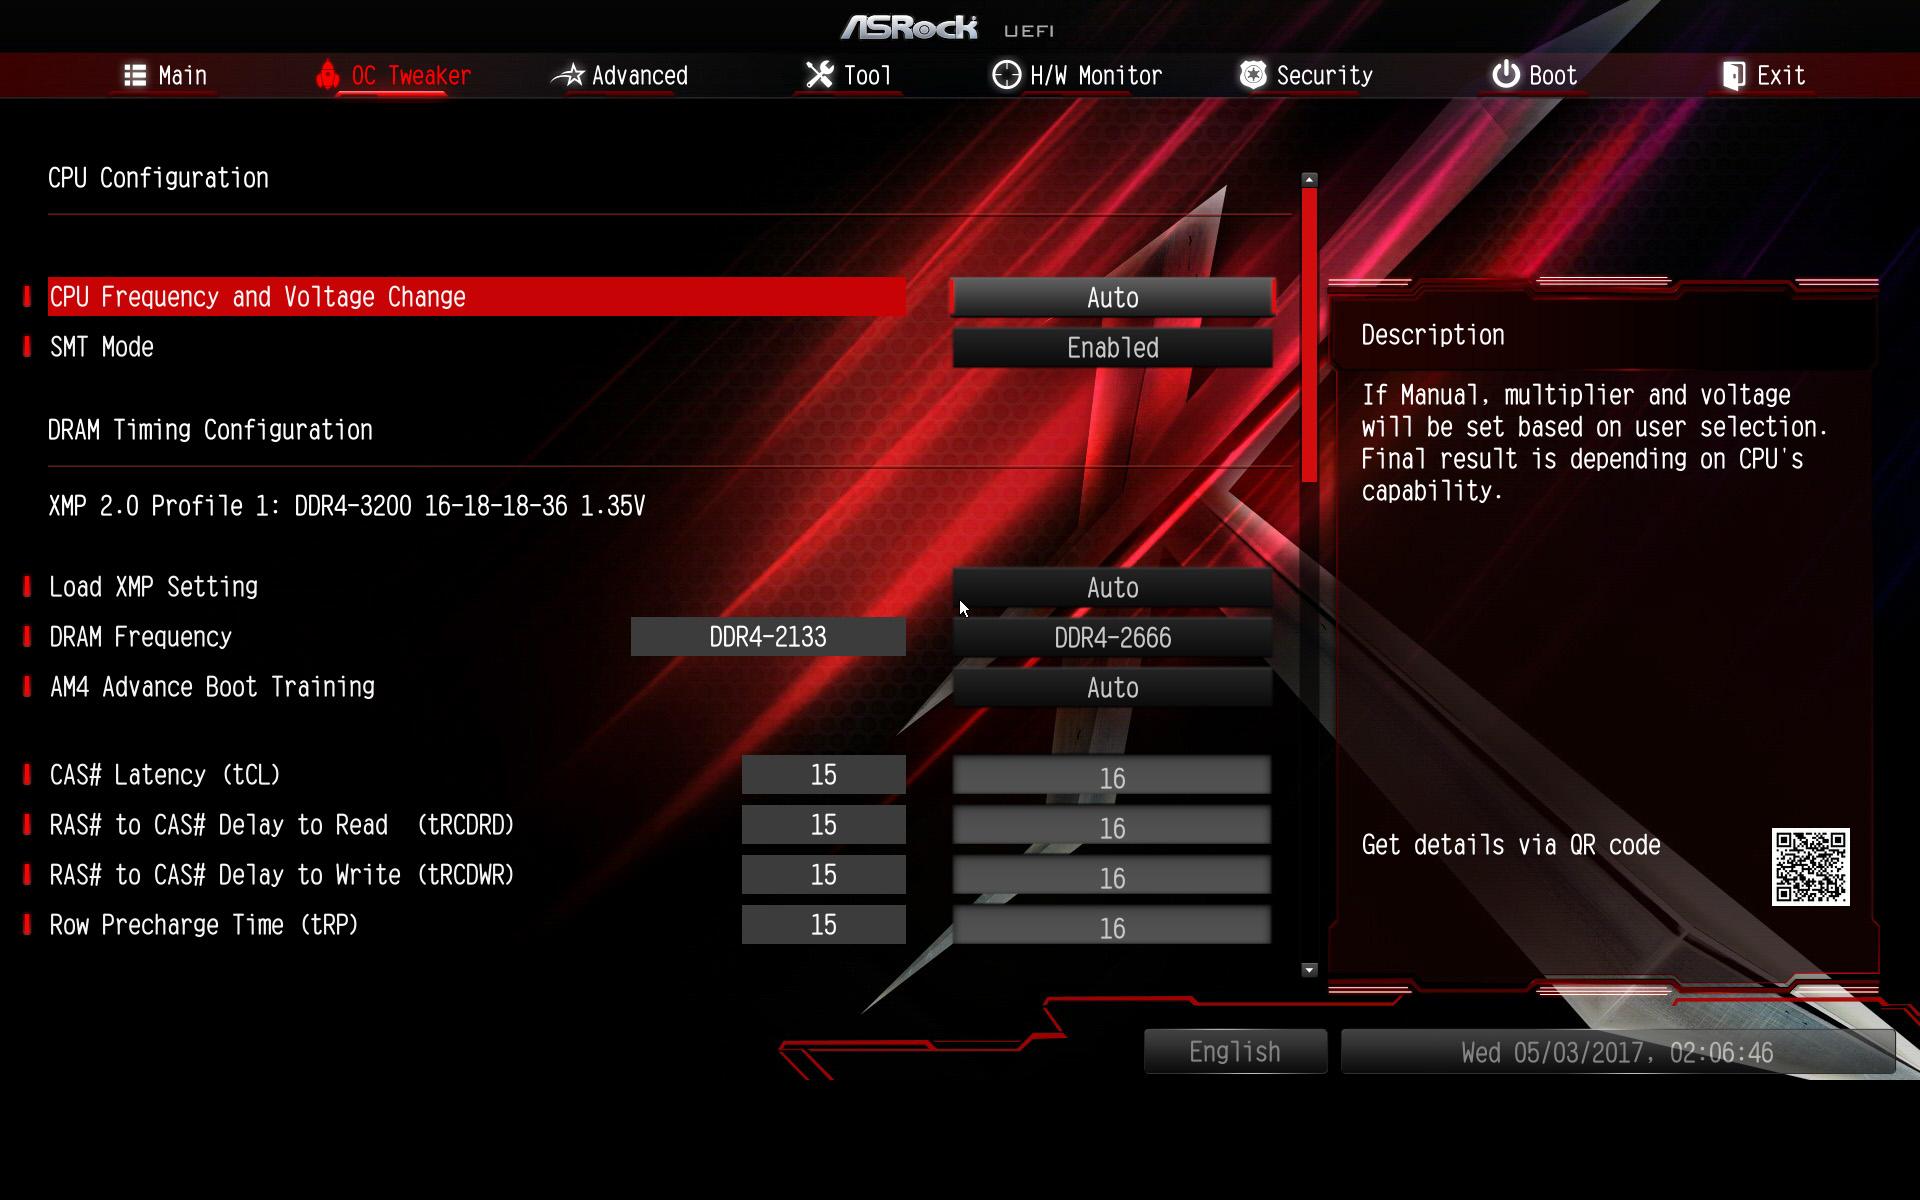 ASRock X370 Killer SLI Review - Test Setup & Overclocking